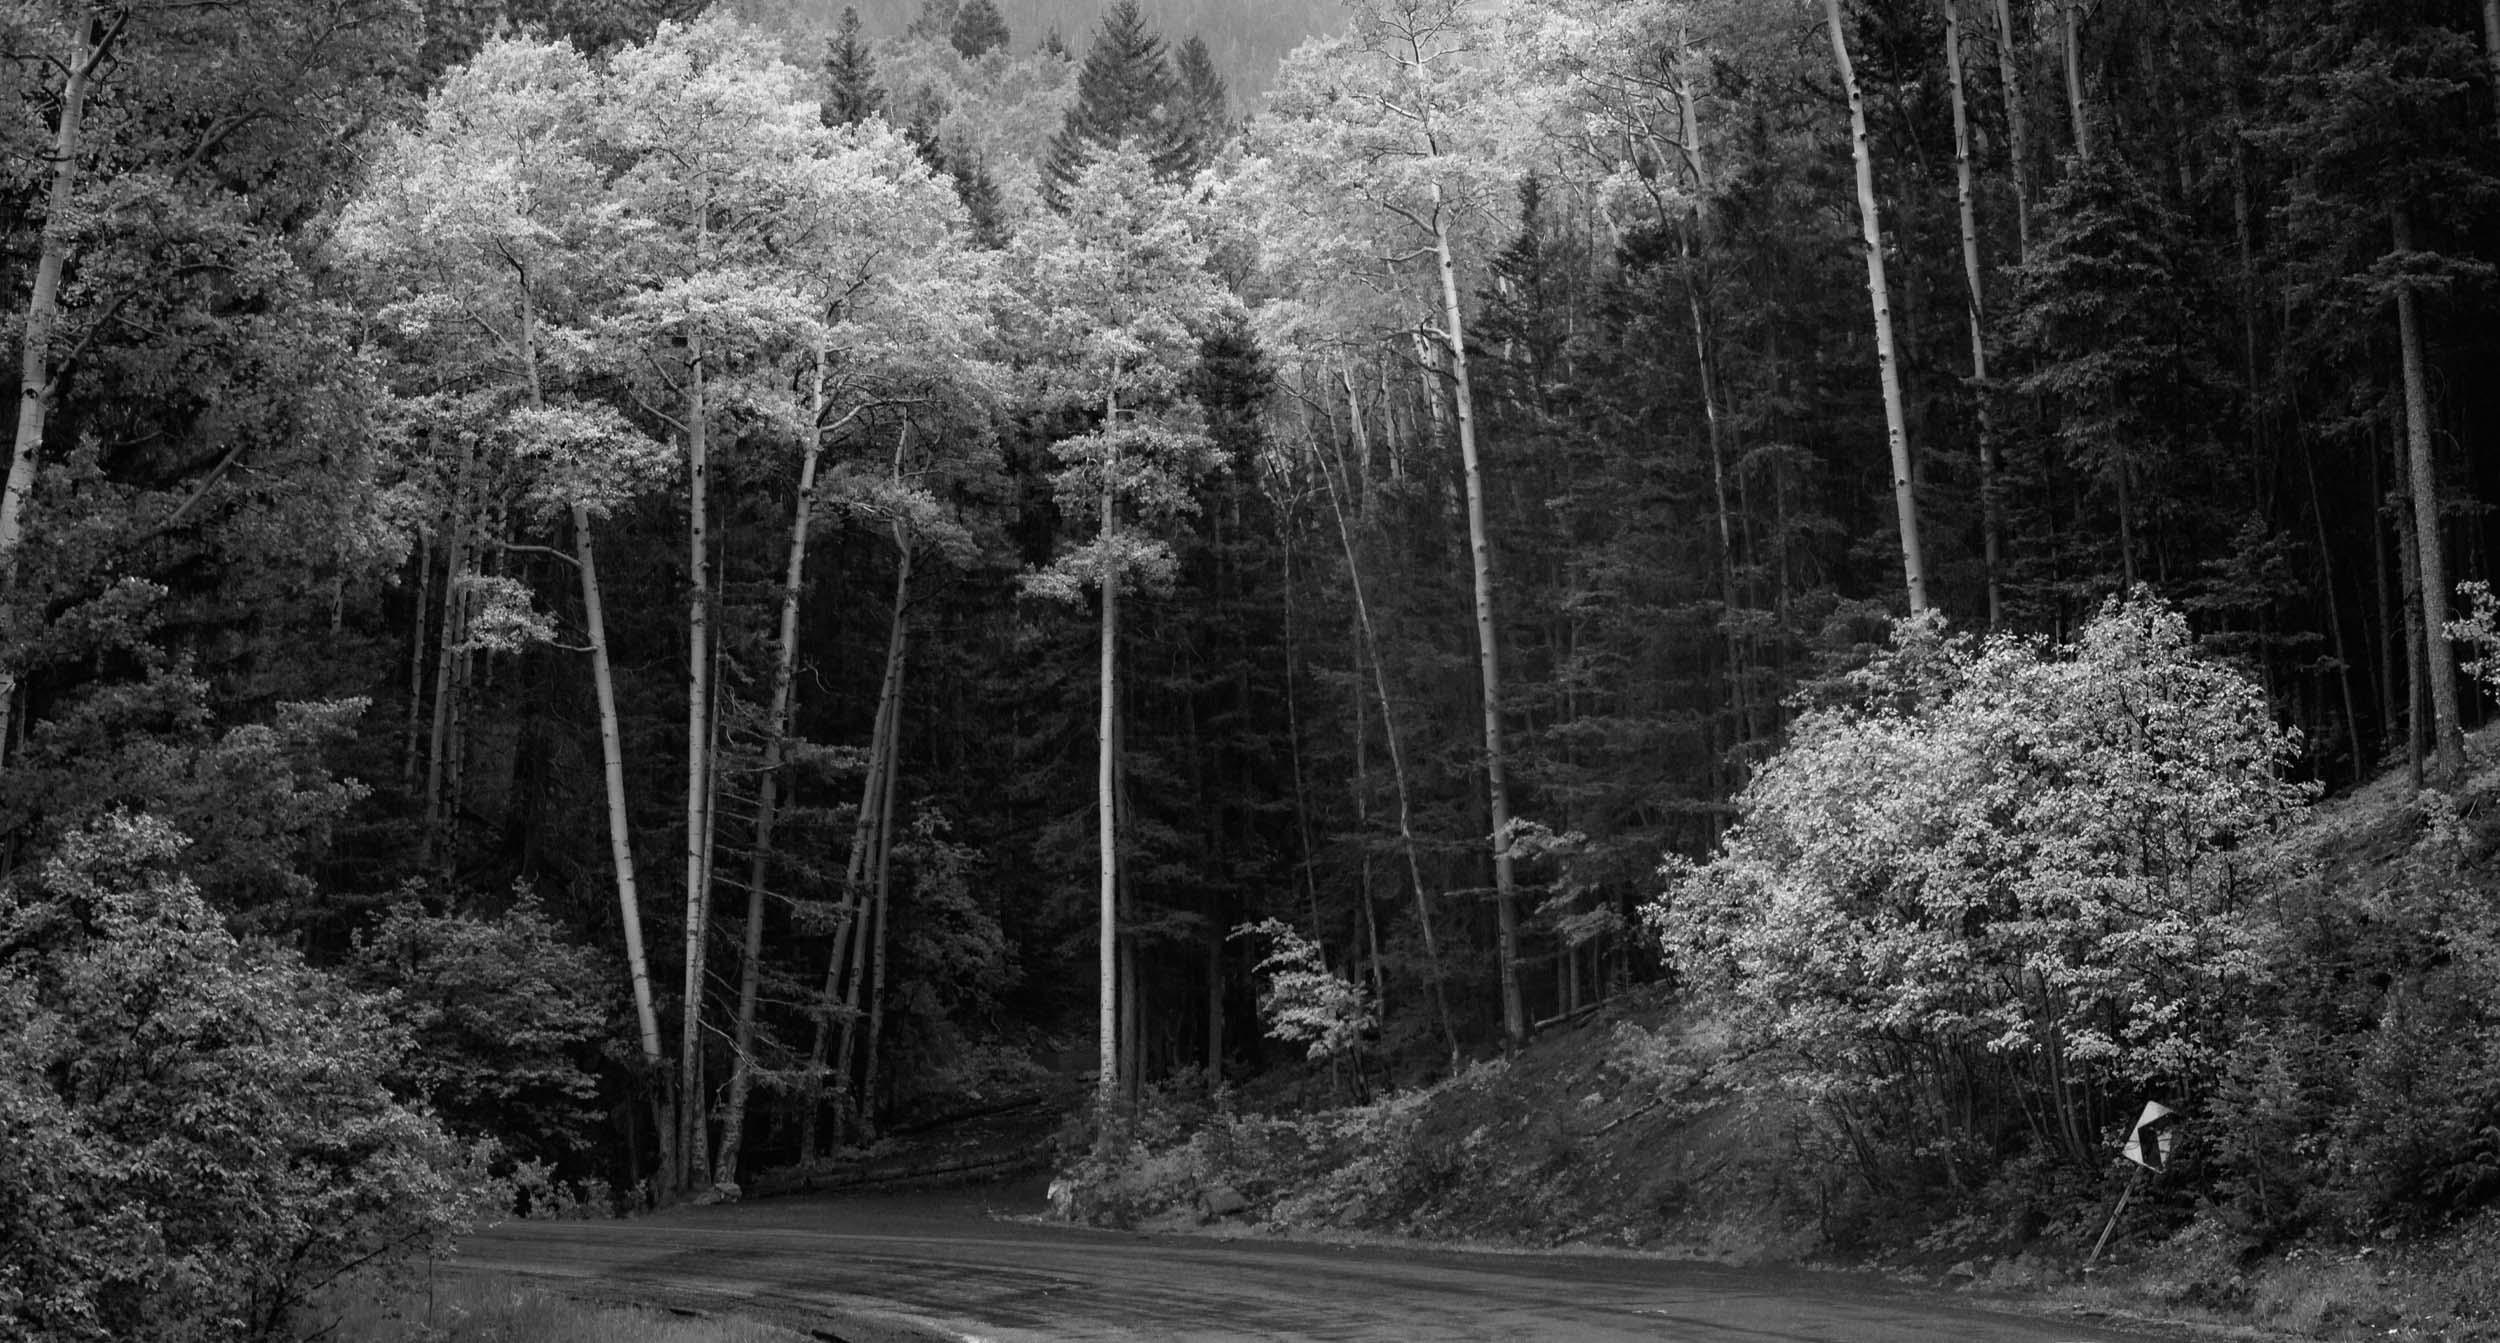 Landscape-bw_009.jpg